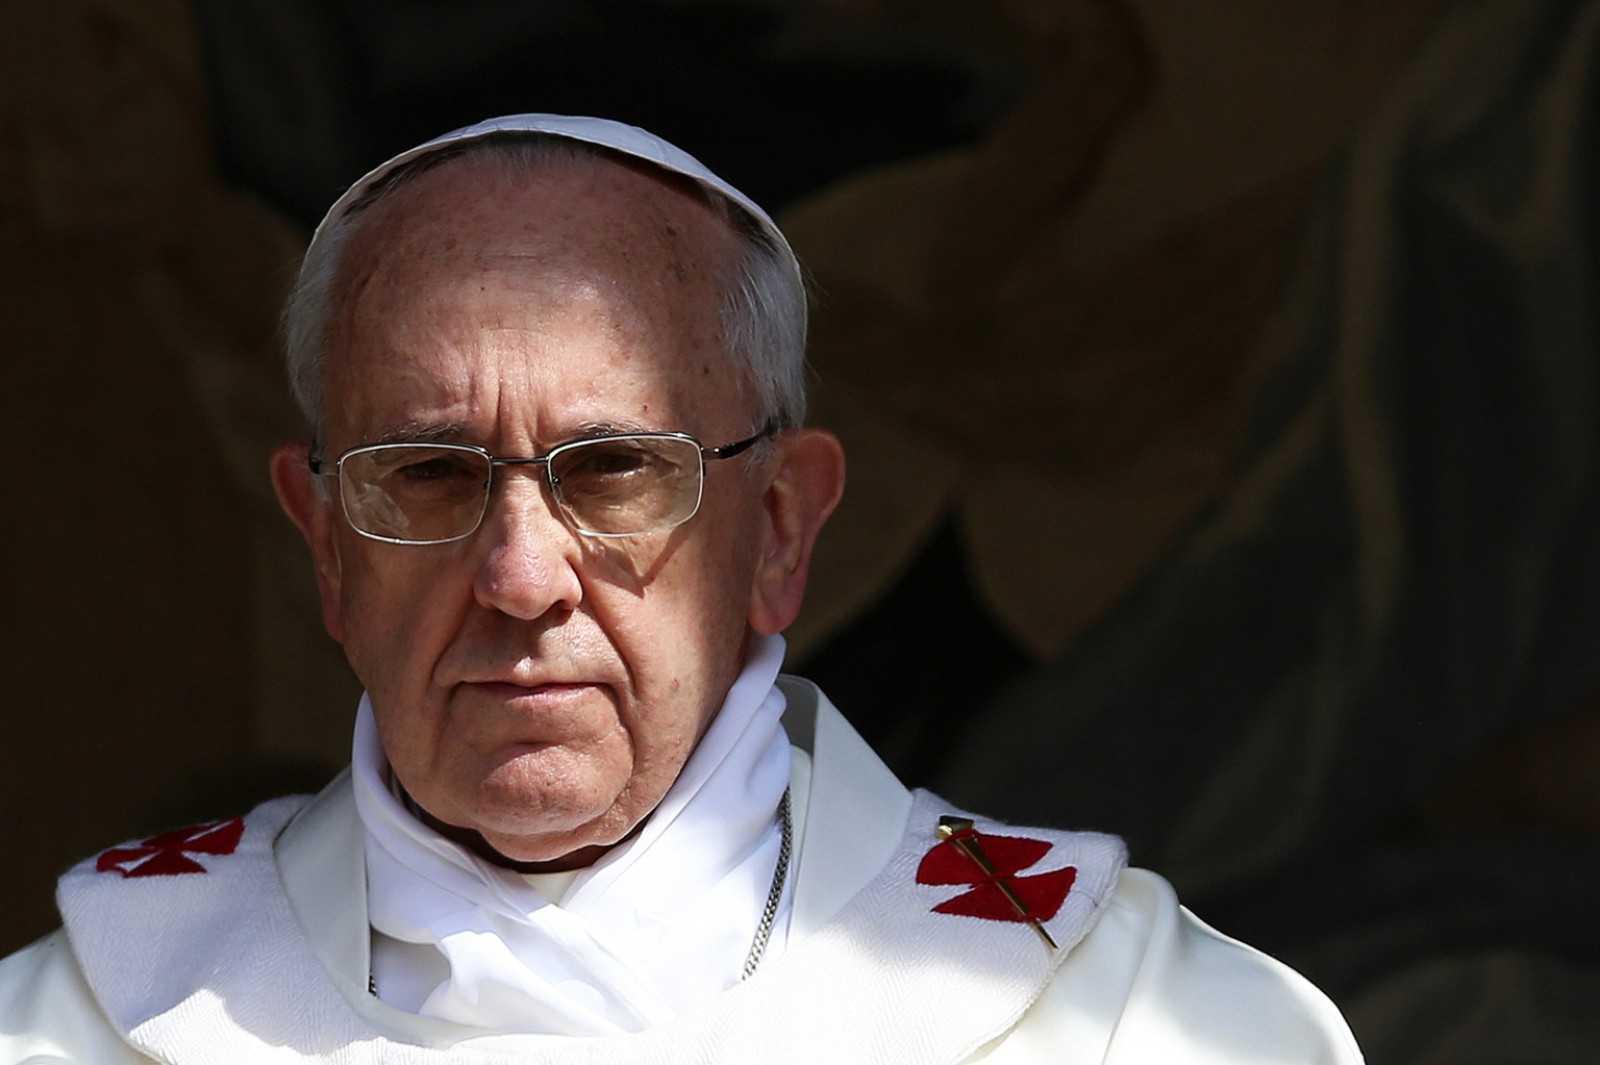 Seful catolicilor din România pretinde ca PATRIARHUL DANIEL l-ar fi invitat verbal pe PAPA FRANCISC in tara